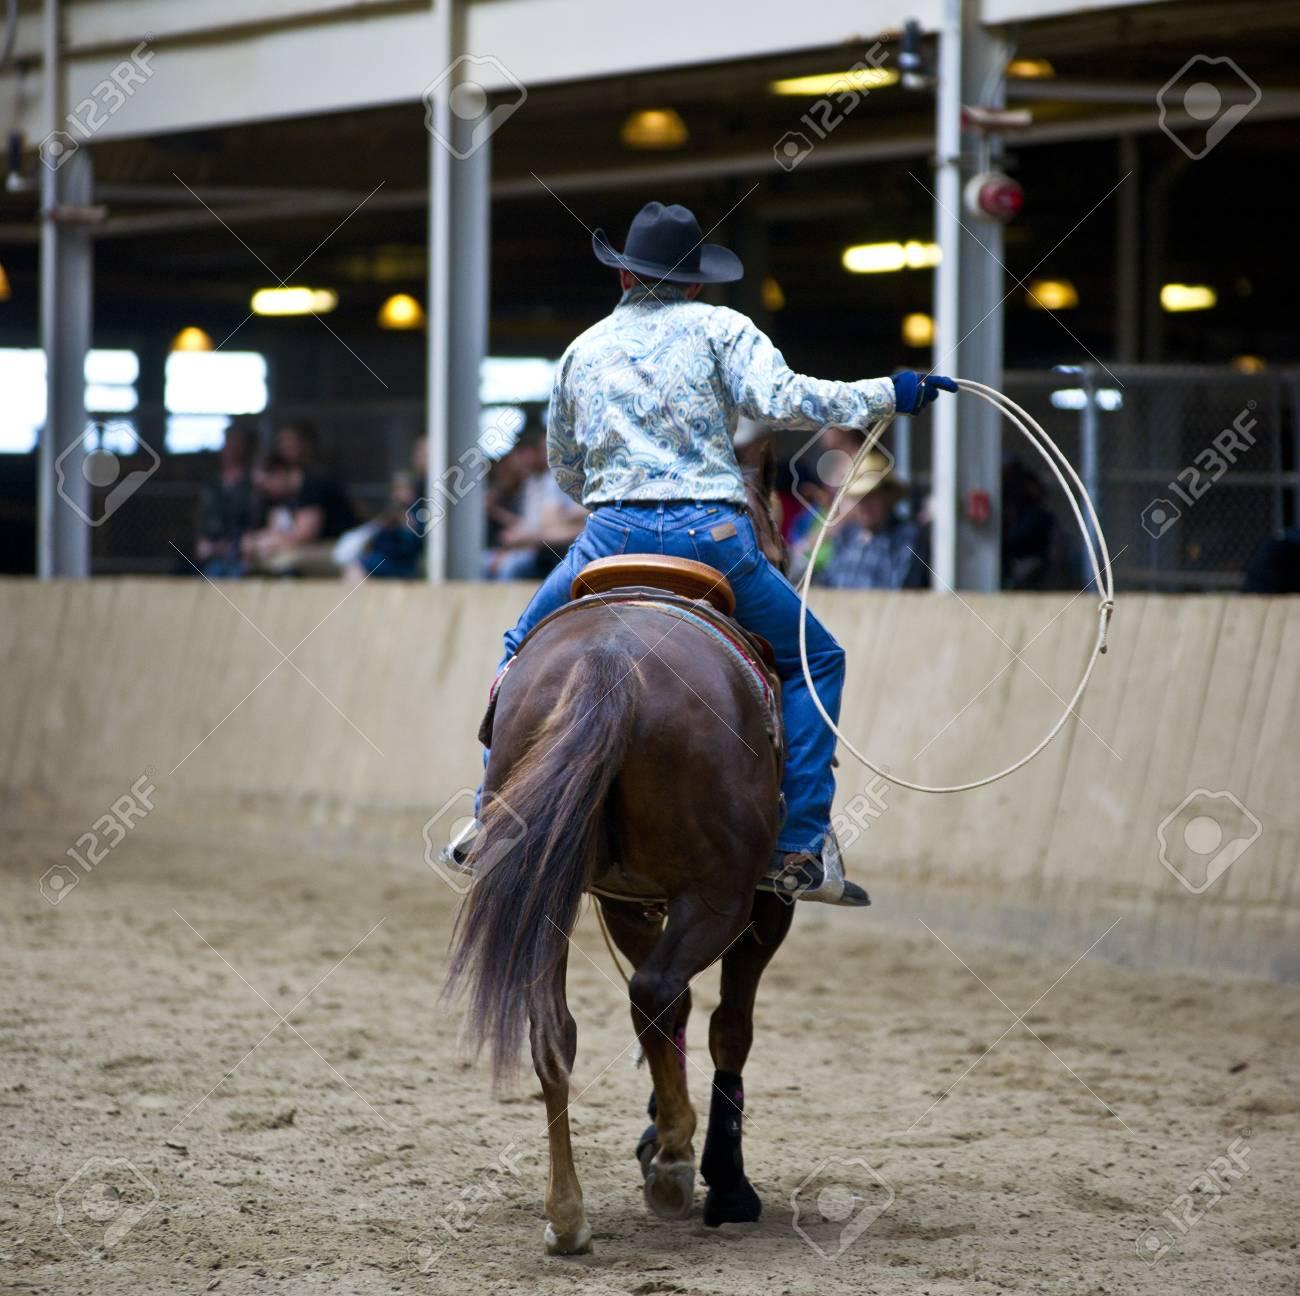 Cowboy - 22064217